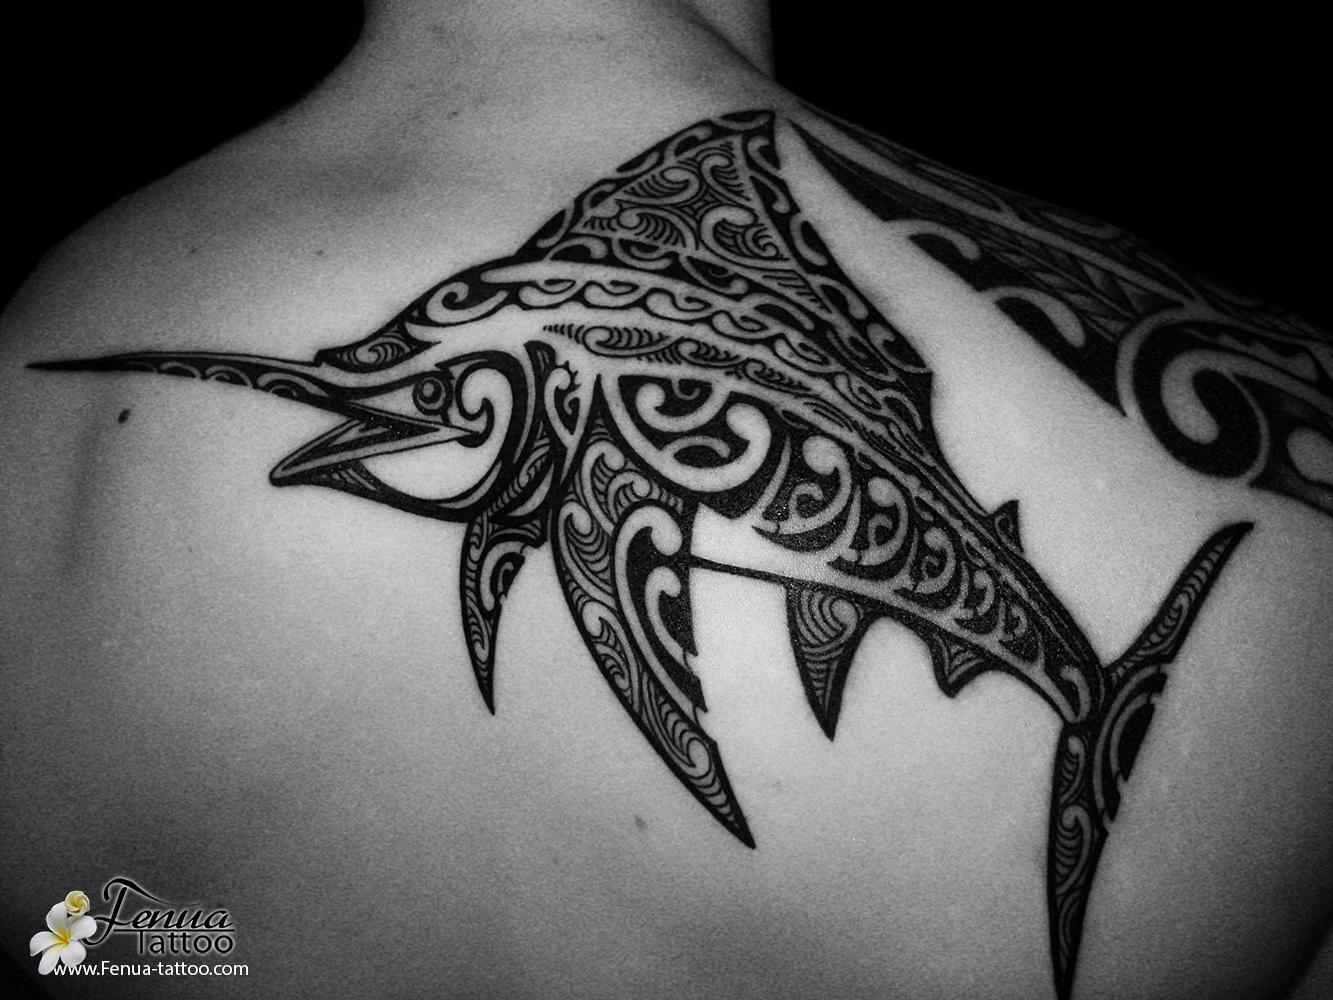 Tatouage Polynesien Et Tribal D Espadon Dans Le Dos Tahiti Tattoo